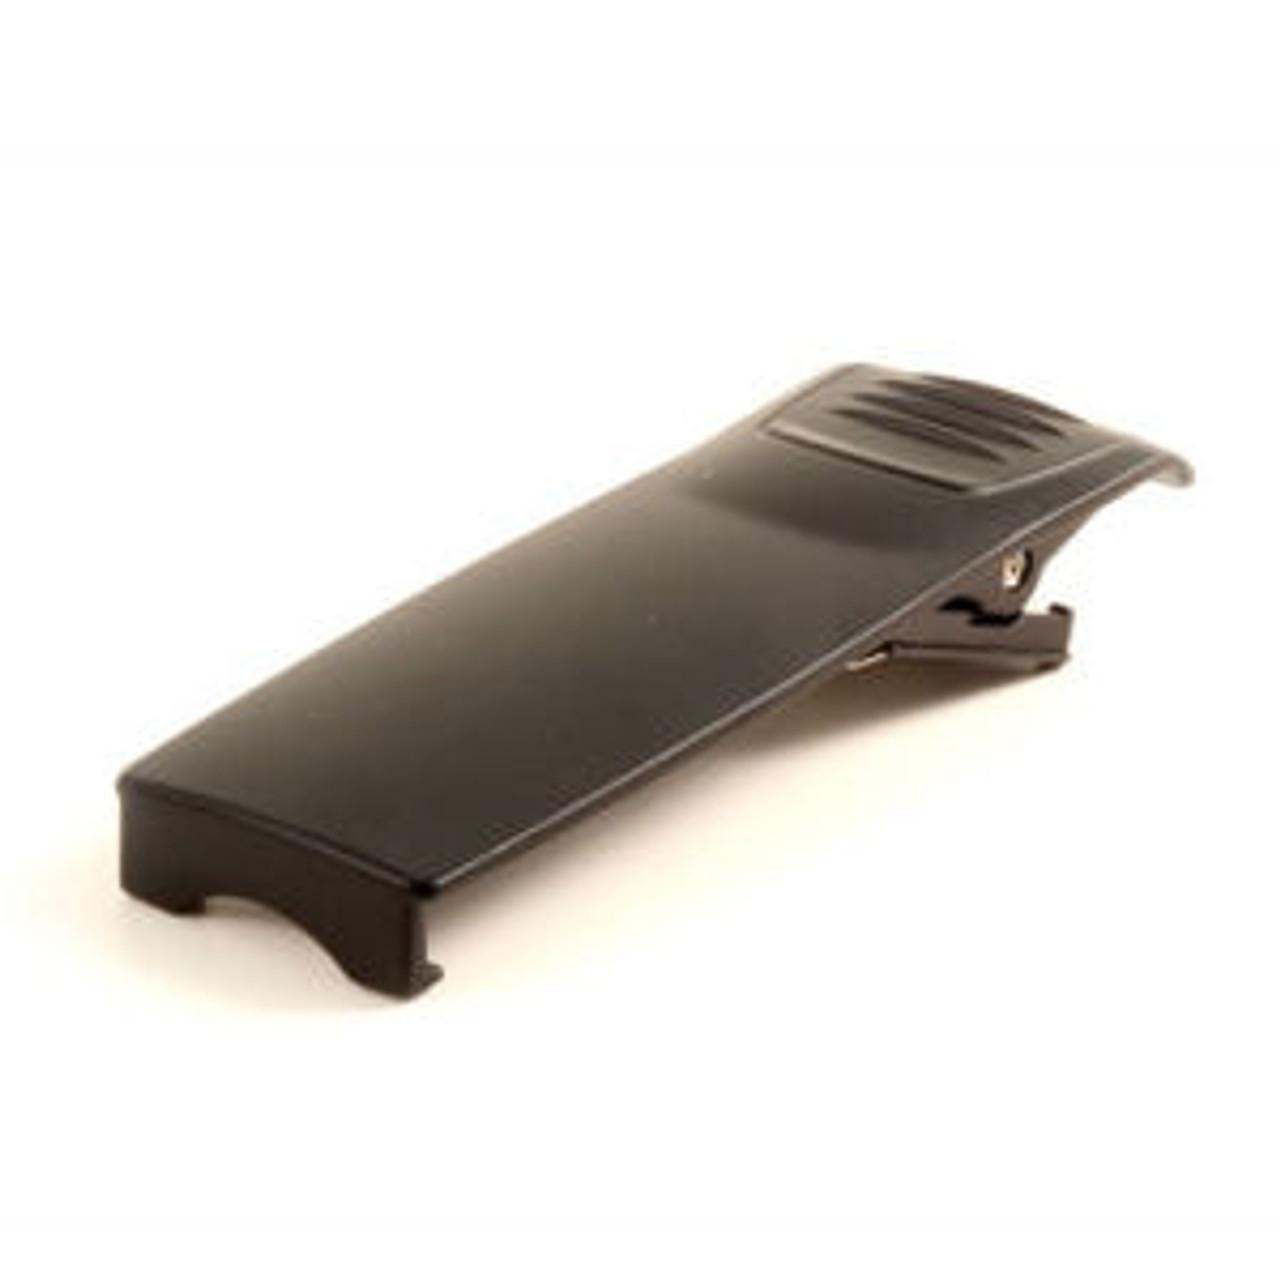 Harris P5100 Metal, Spring Loaded Belt Clip